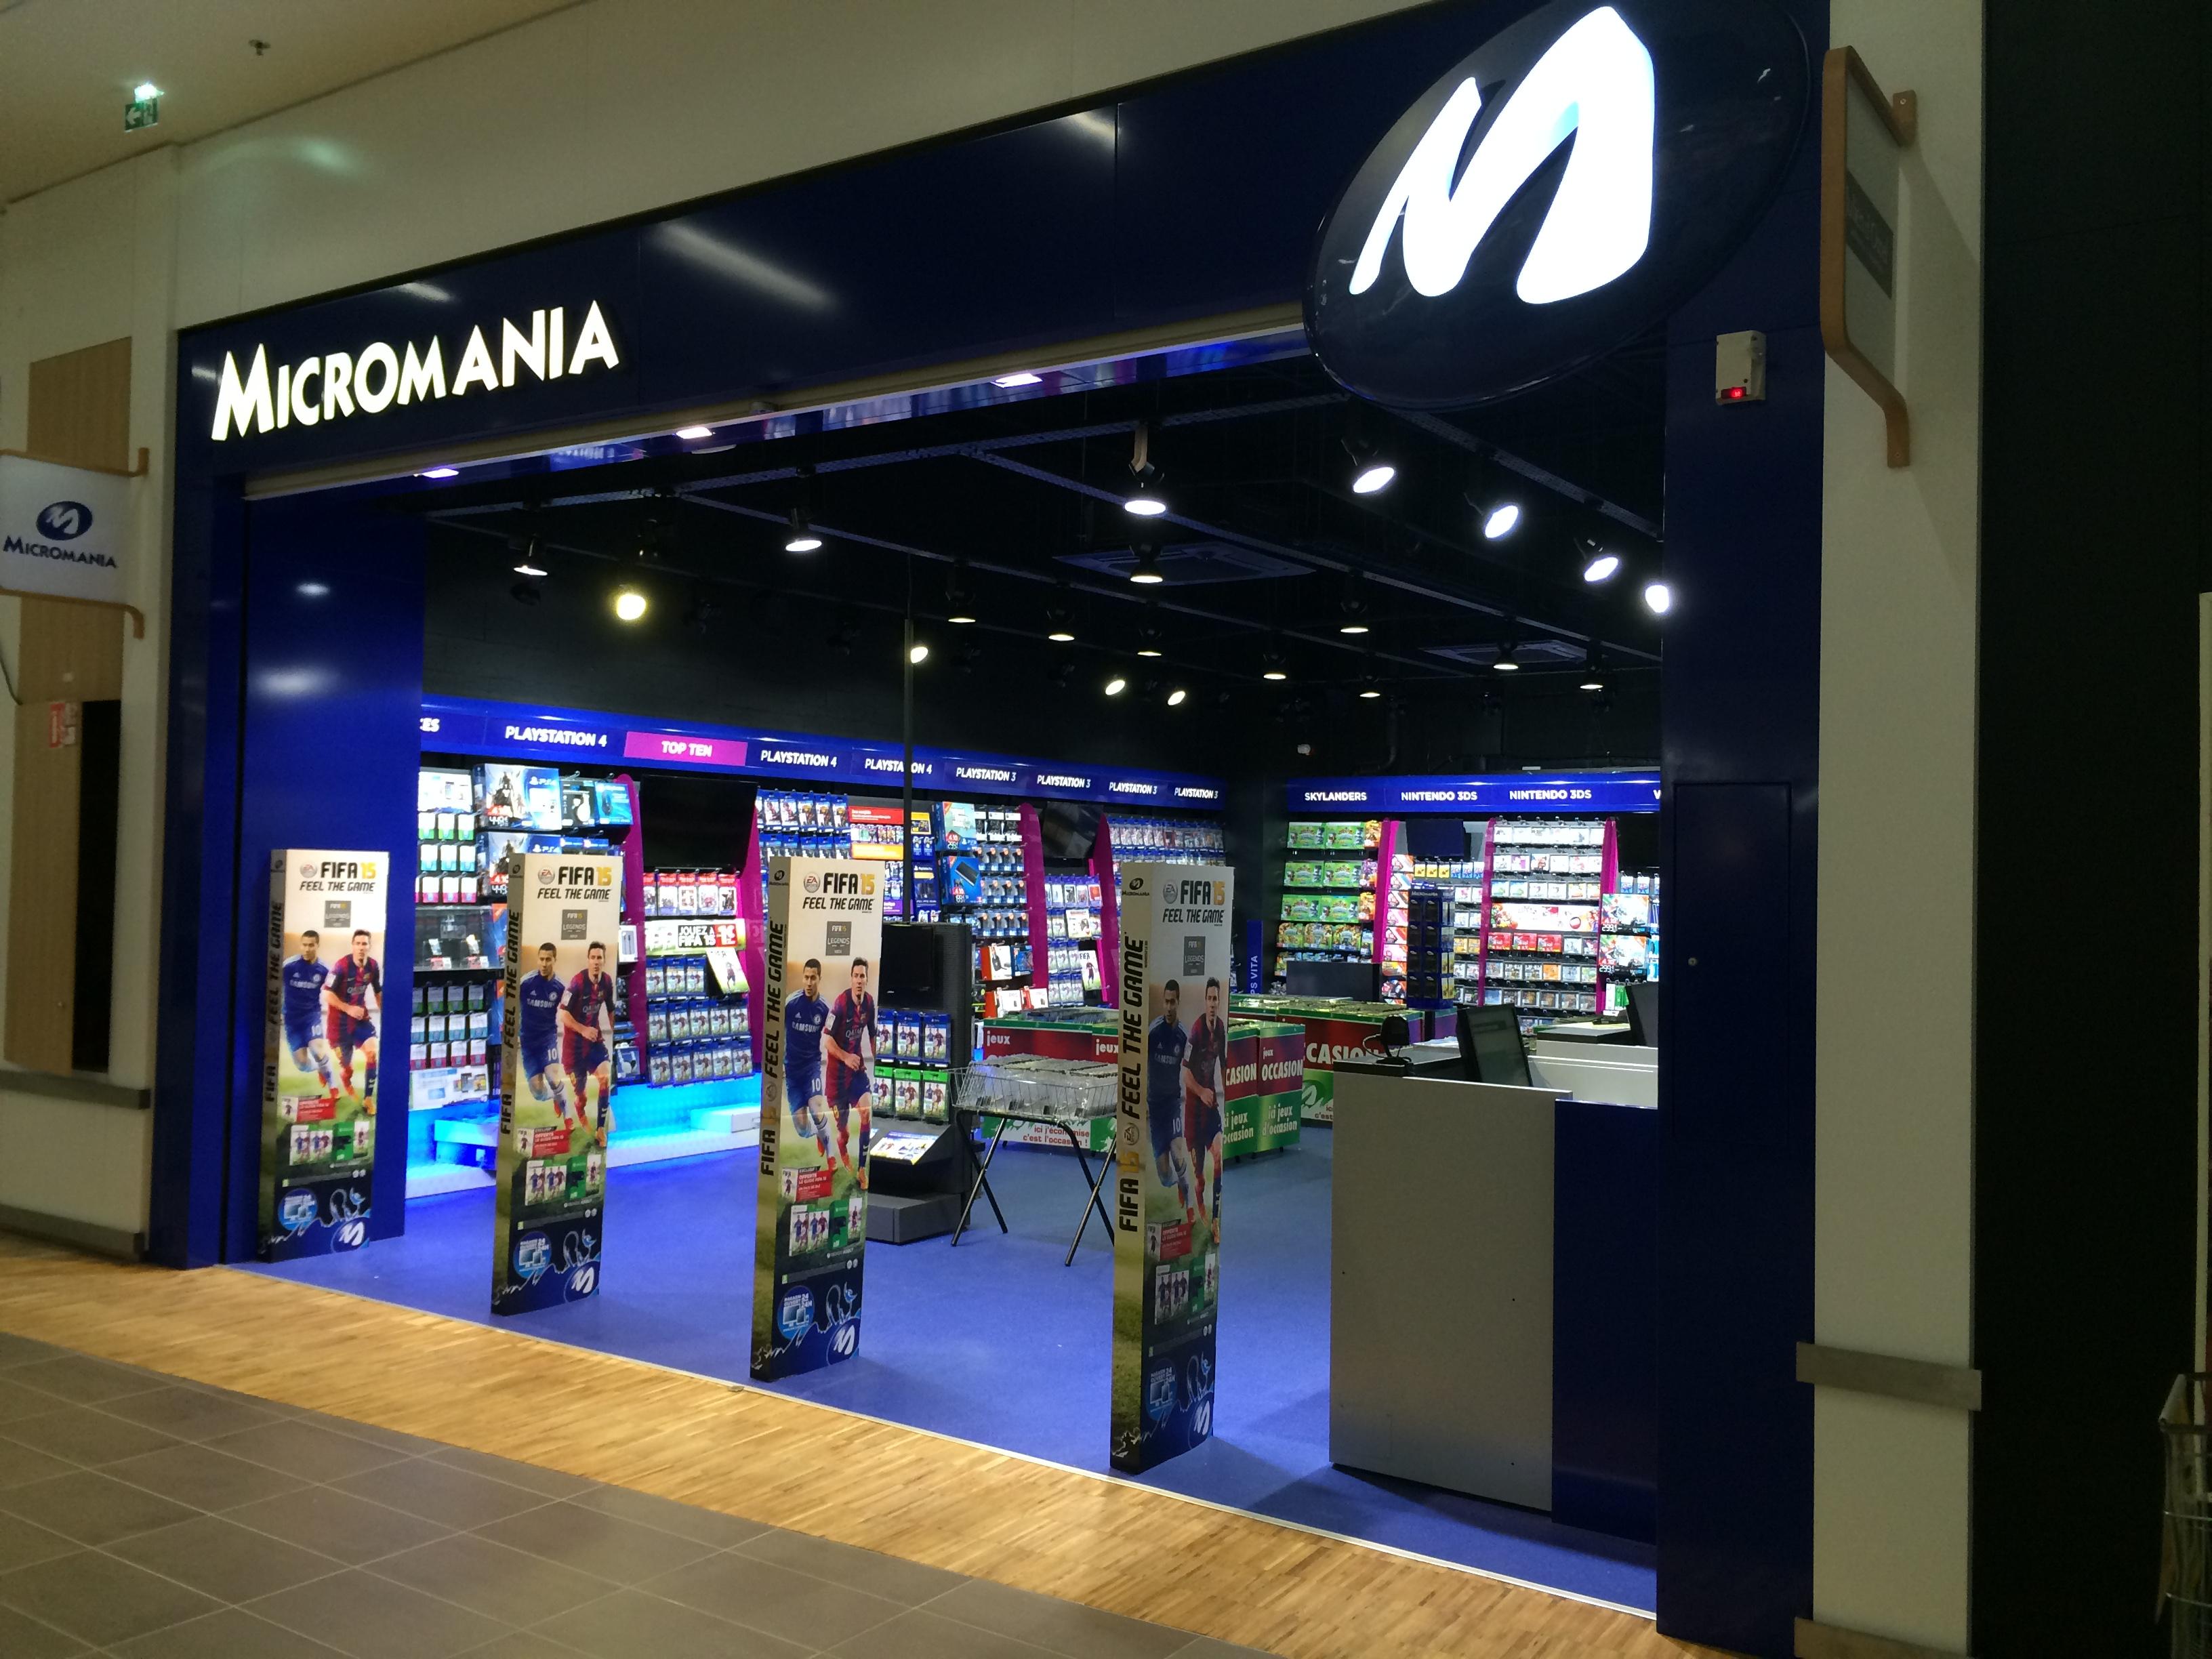 magasin jeux vid o mundolsheim centre commercial cora infos et adresse micromania. Black Bedroom Furniture Sets. Home Design Ideas